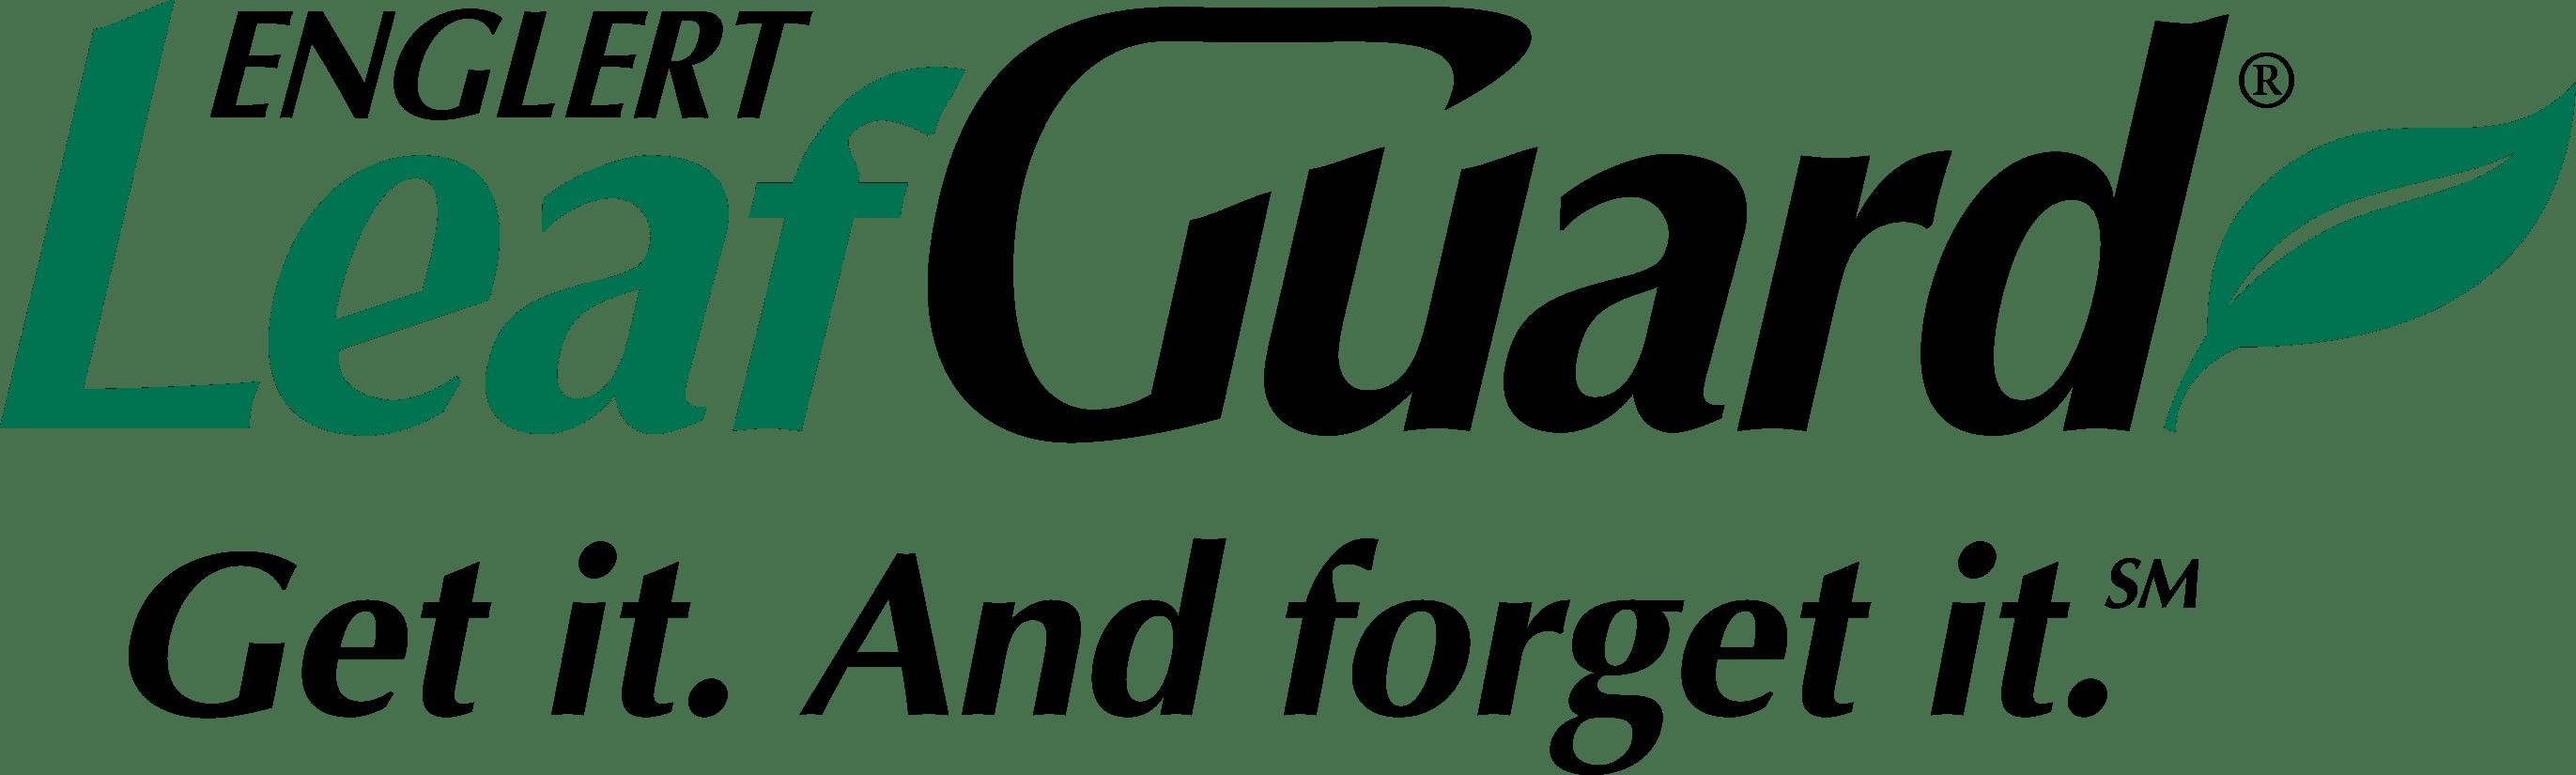 Leafguard-no-white-background